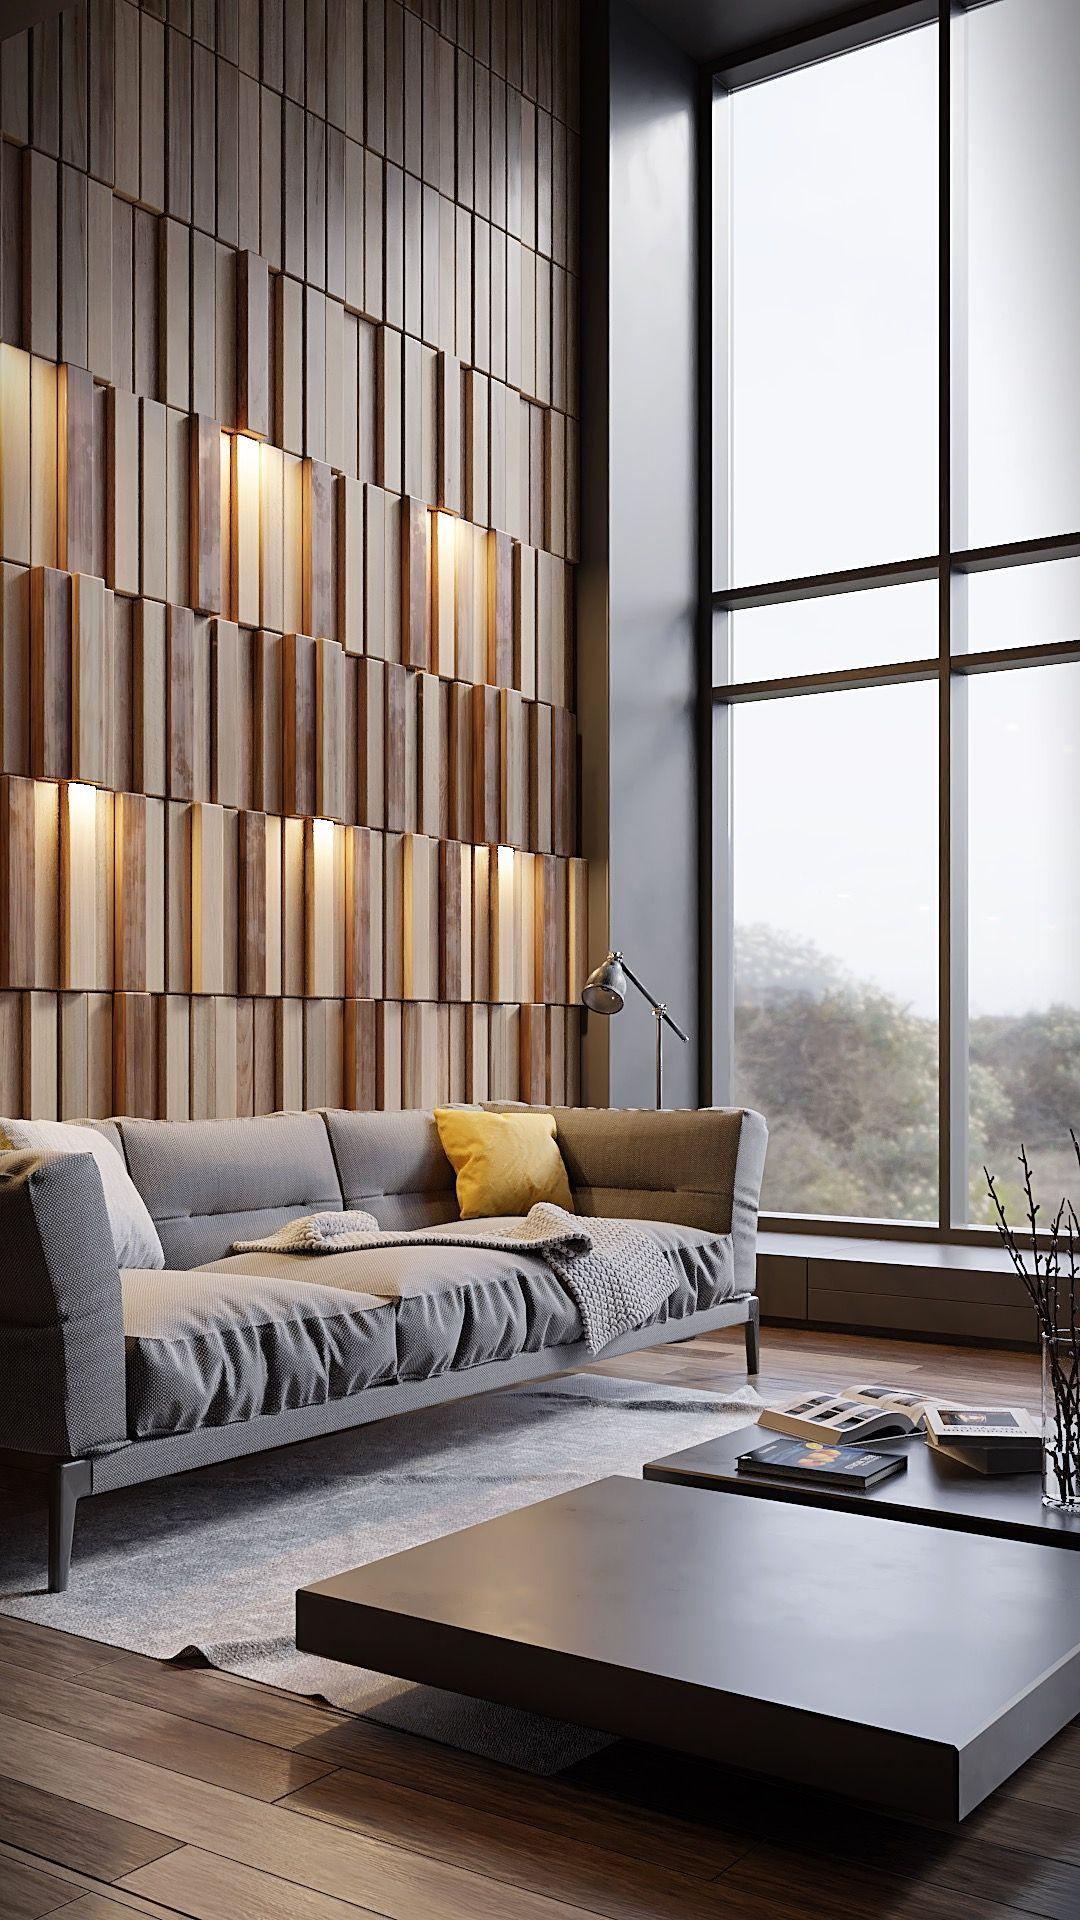 Living Room Luxury Living Room Design Wooden Wall Design Interior Wall Design Living room wall design